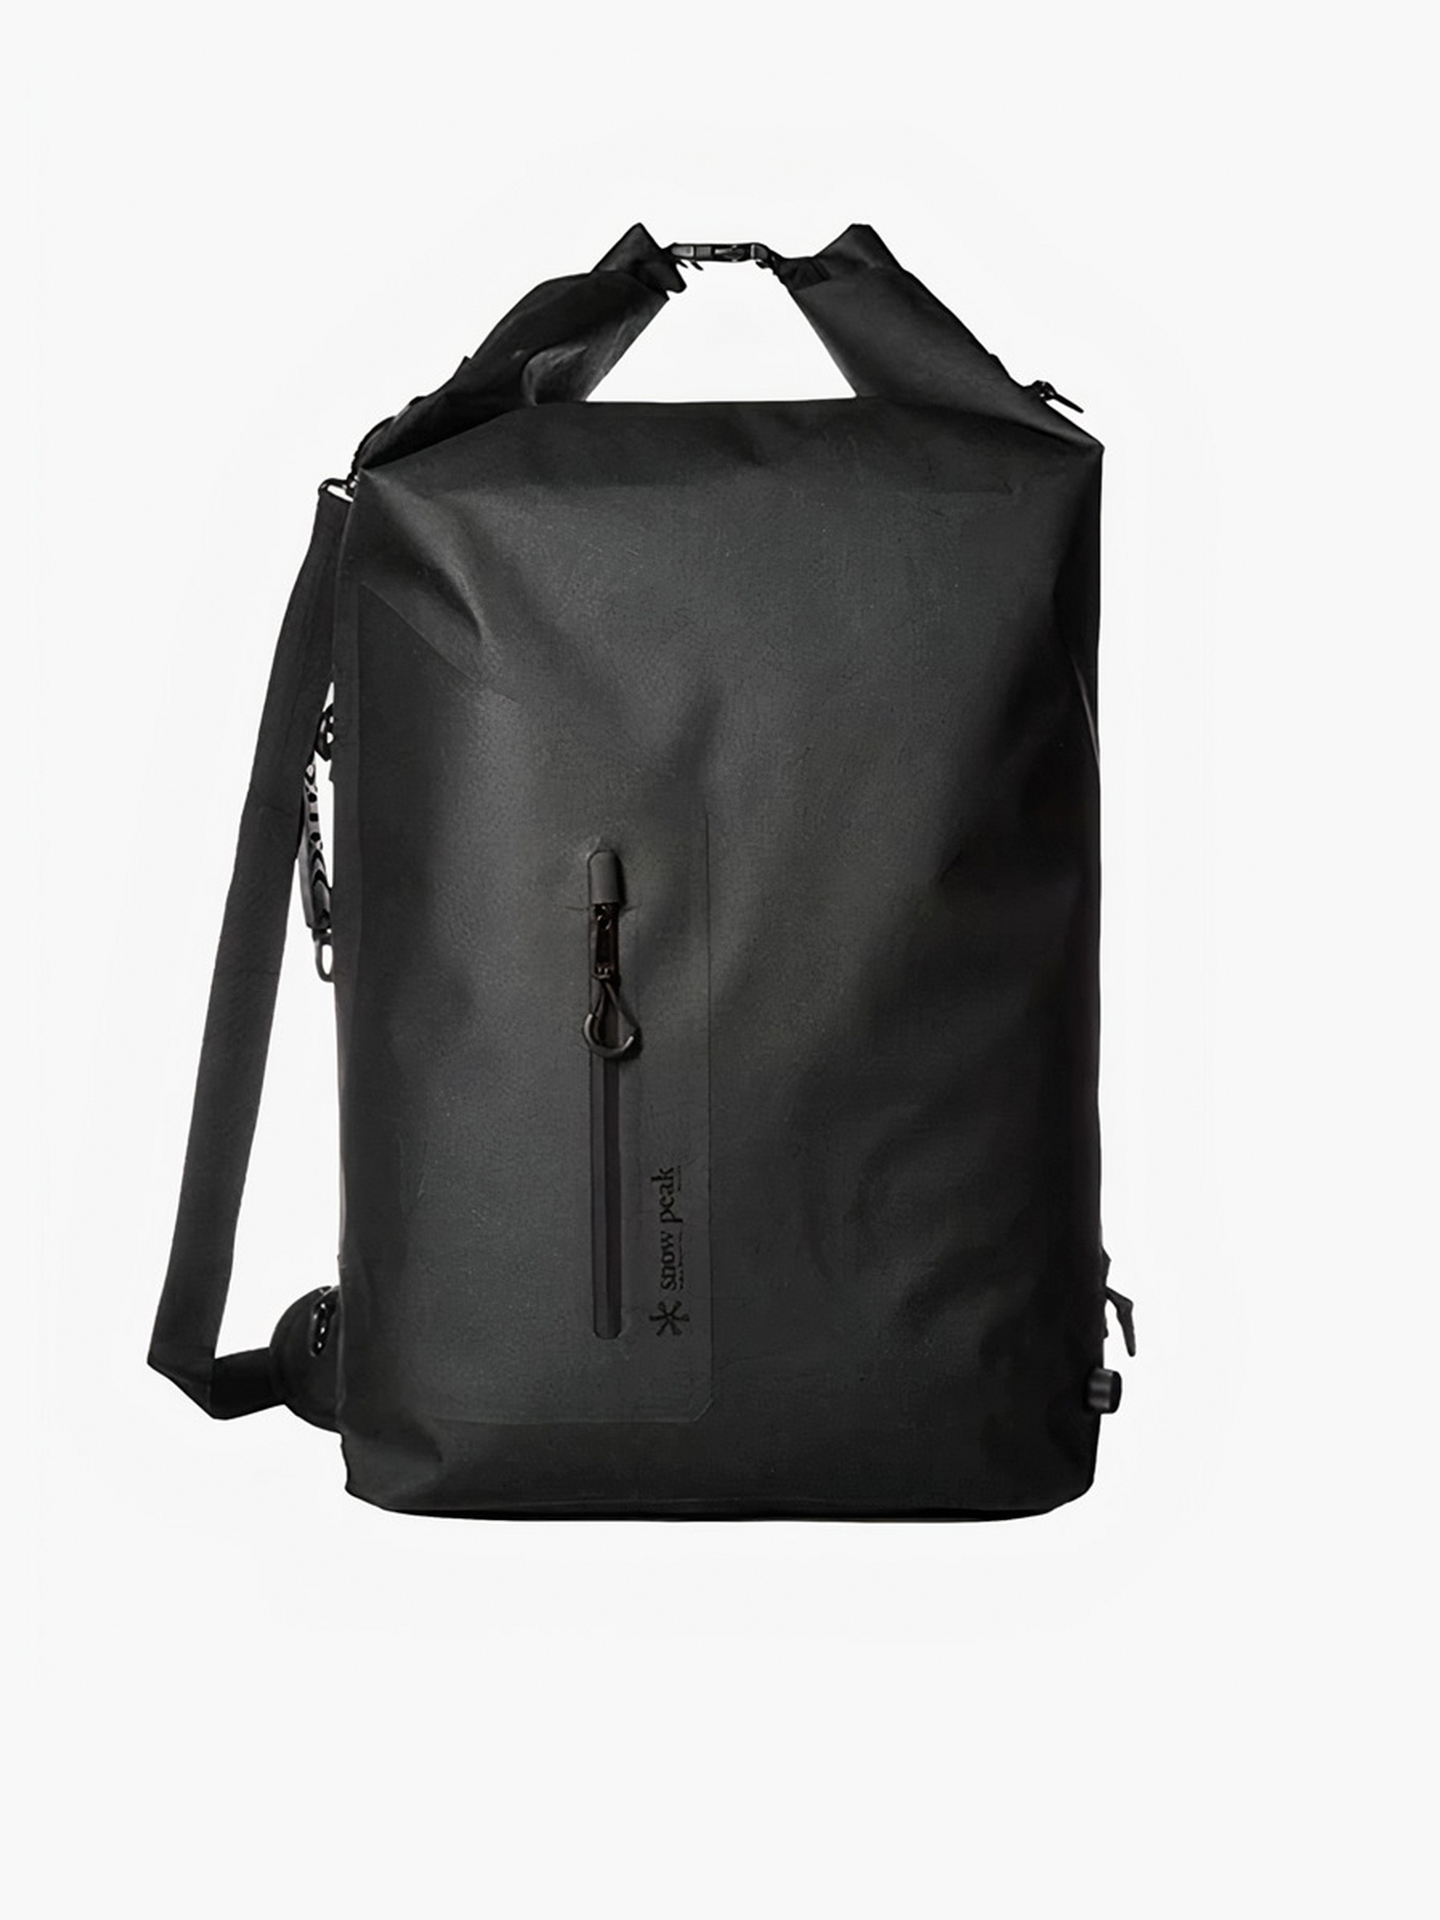 Рюкзак водонепроницаемый Snow Peak 4WAY Waterproof DRY Bag, 78L